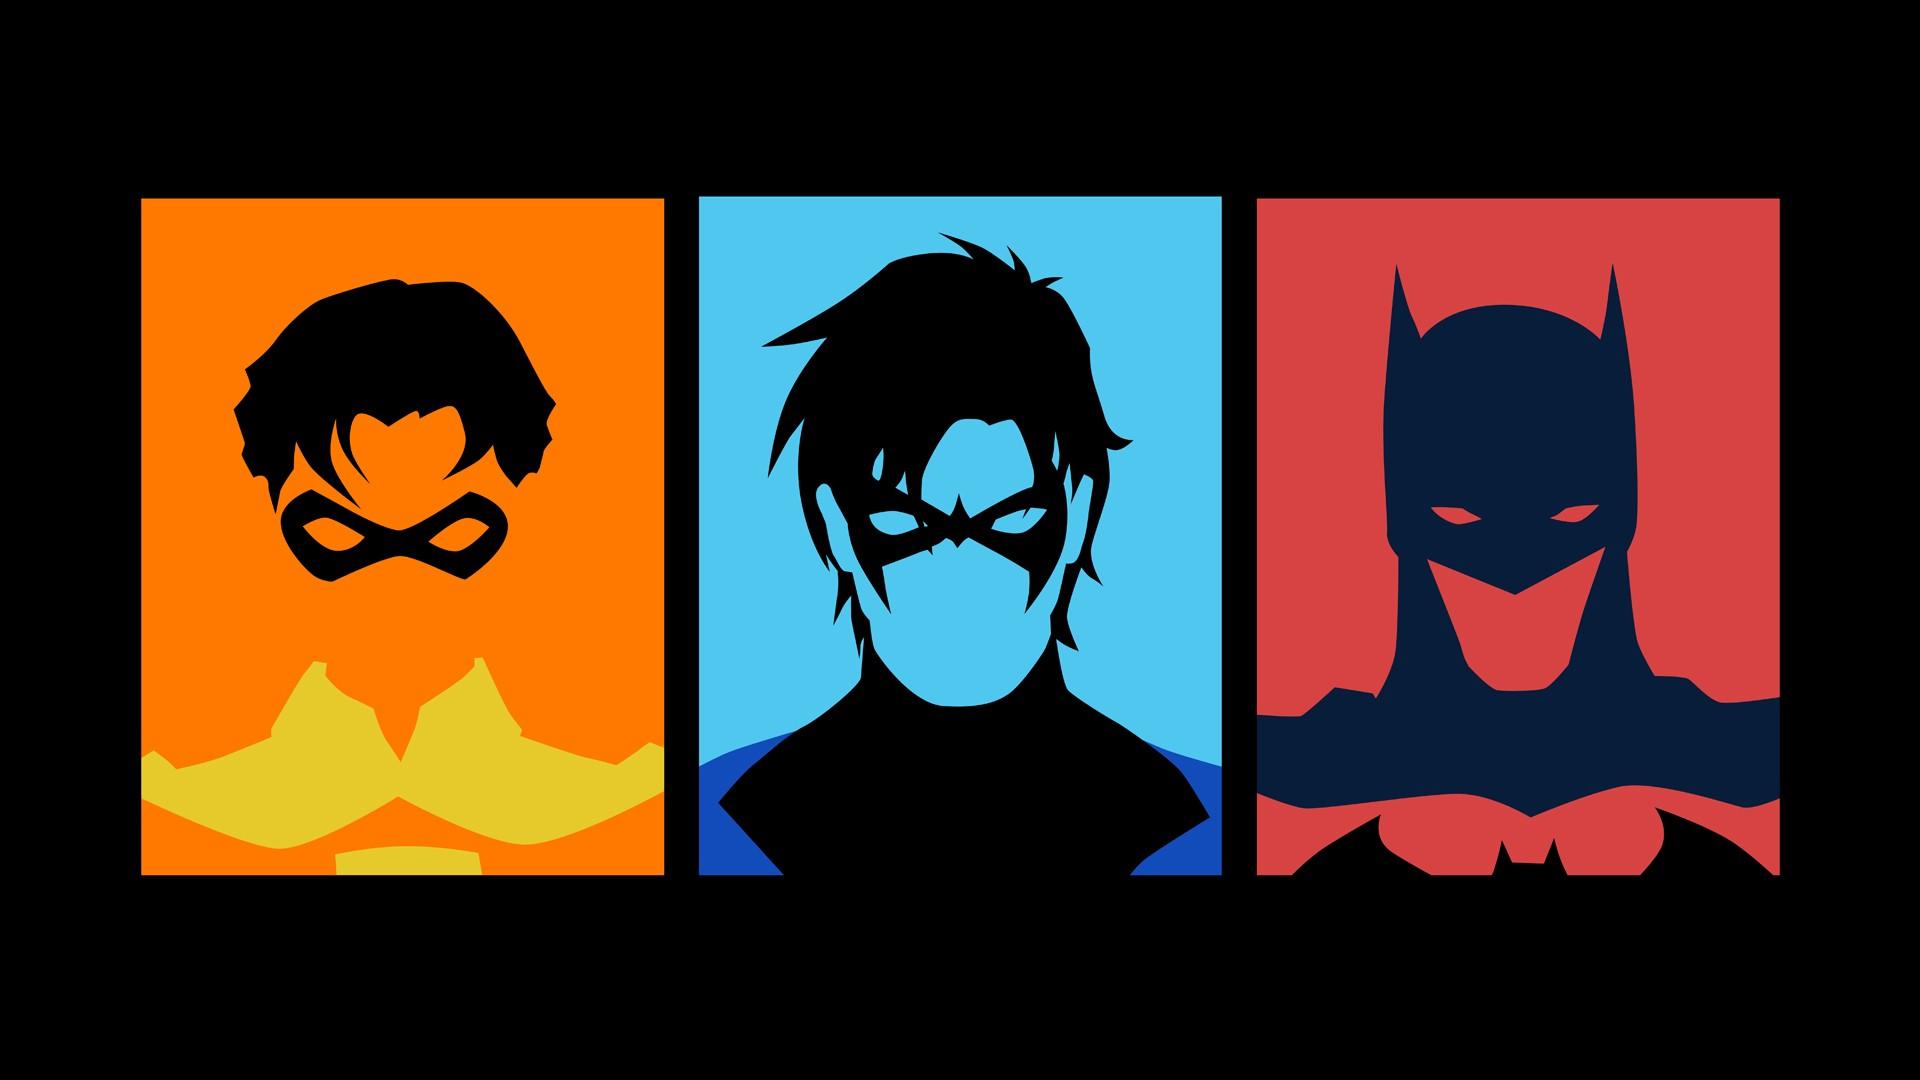 50 batman logo wallpapers for free download (hd 1080p)